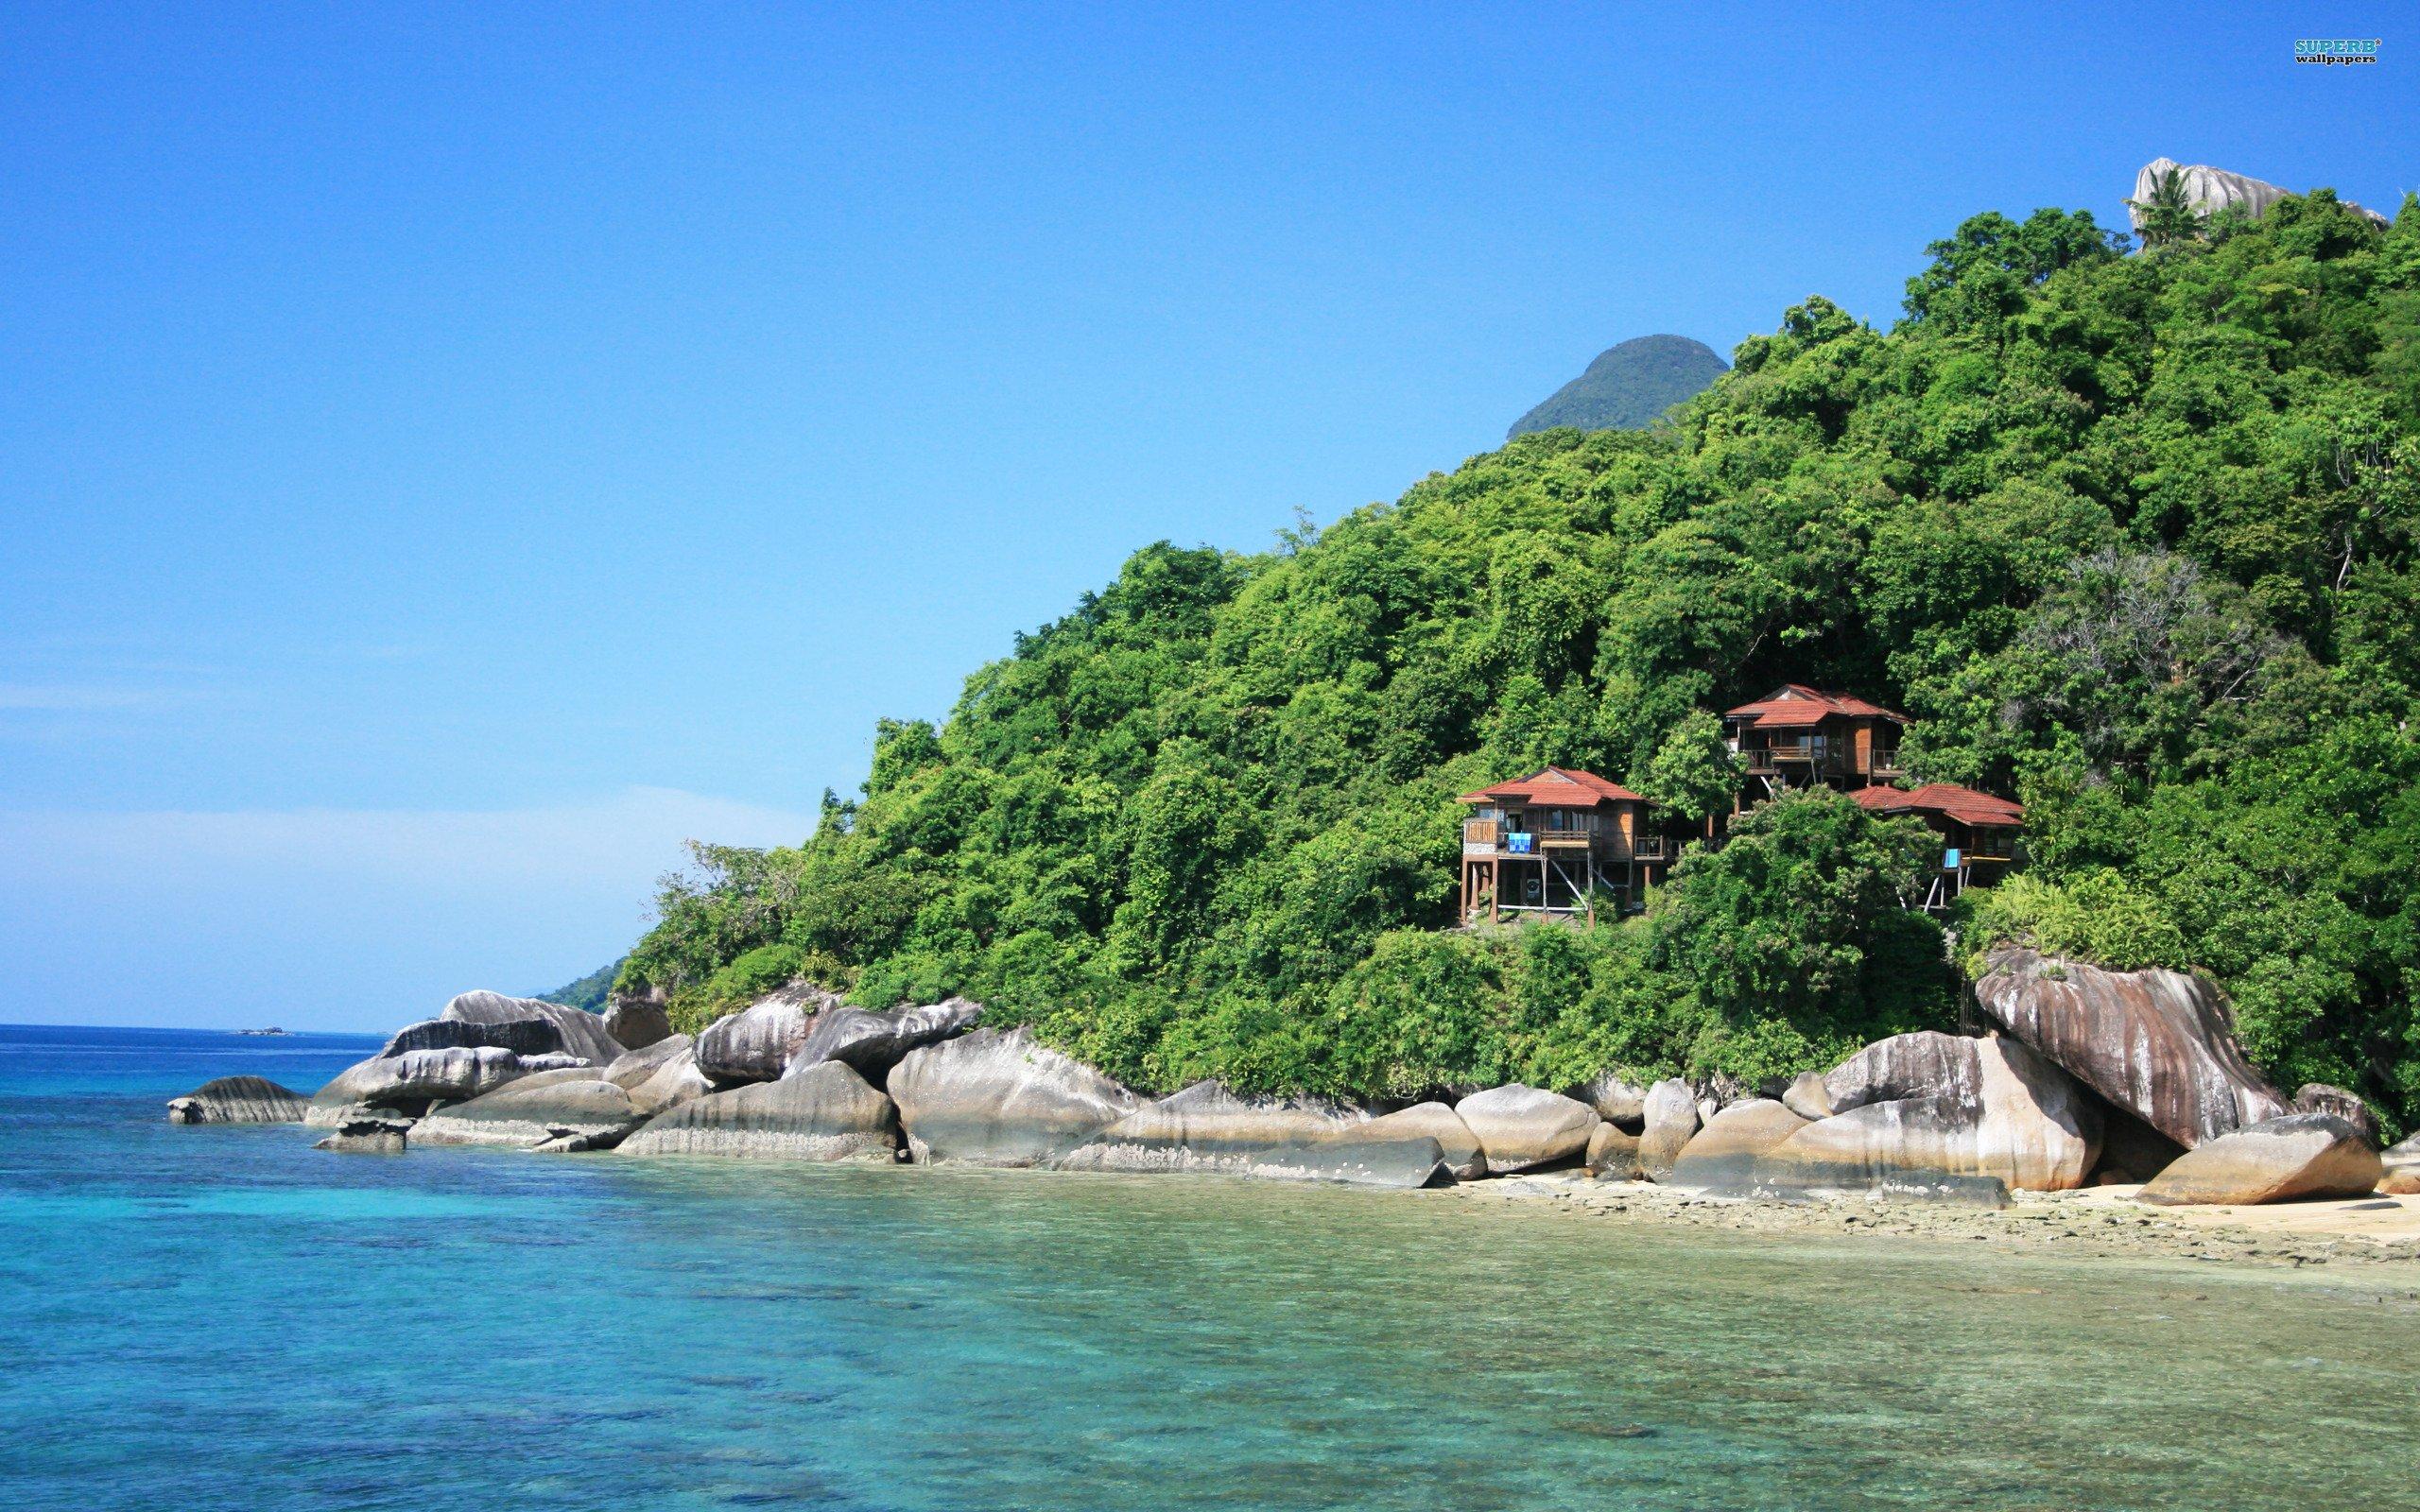 Tidung Island coast, Singapore